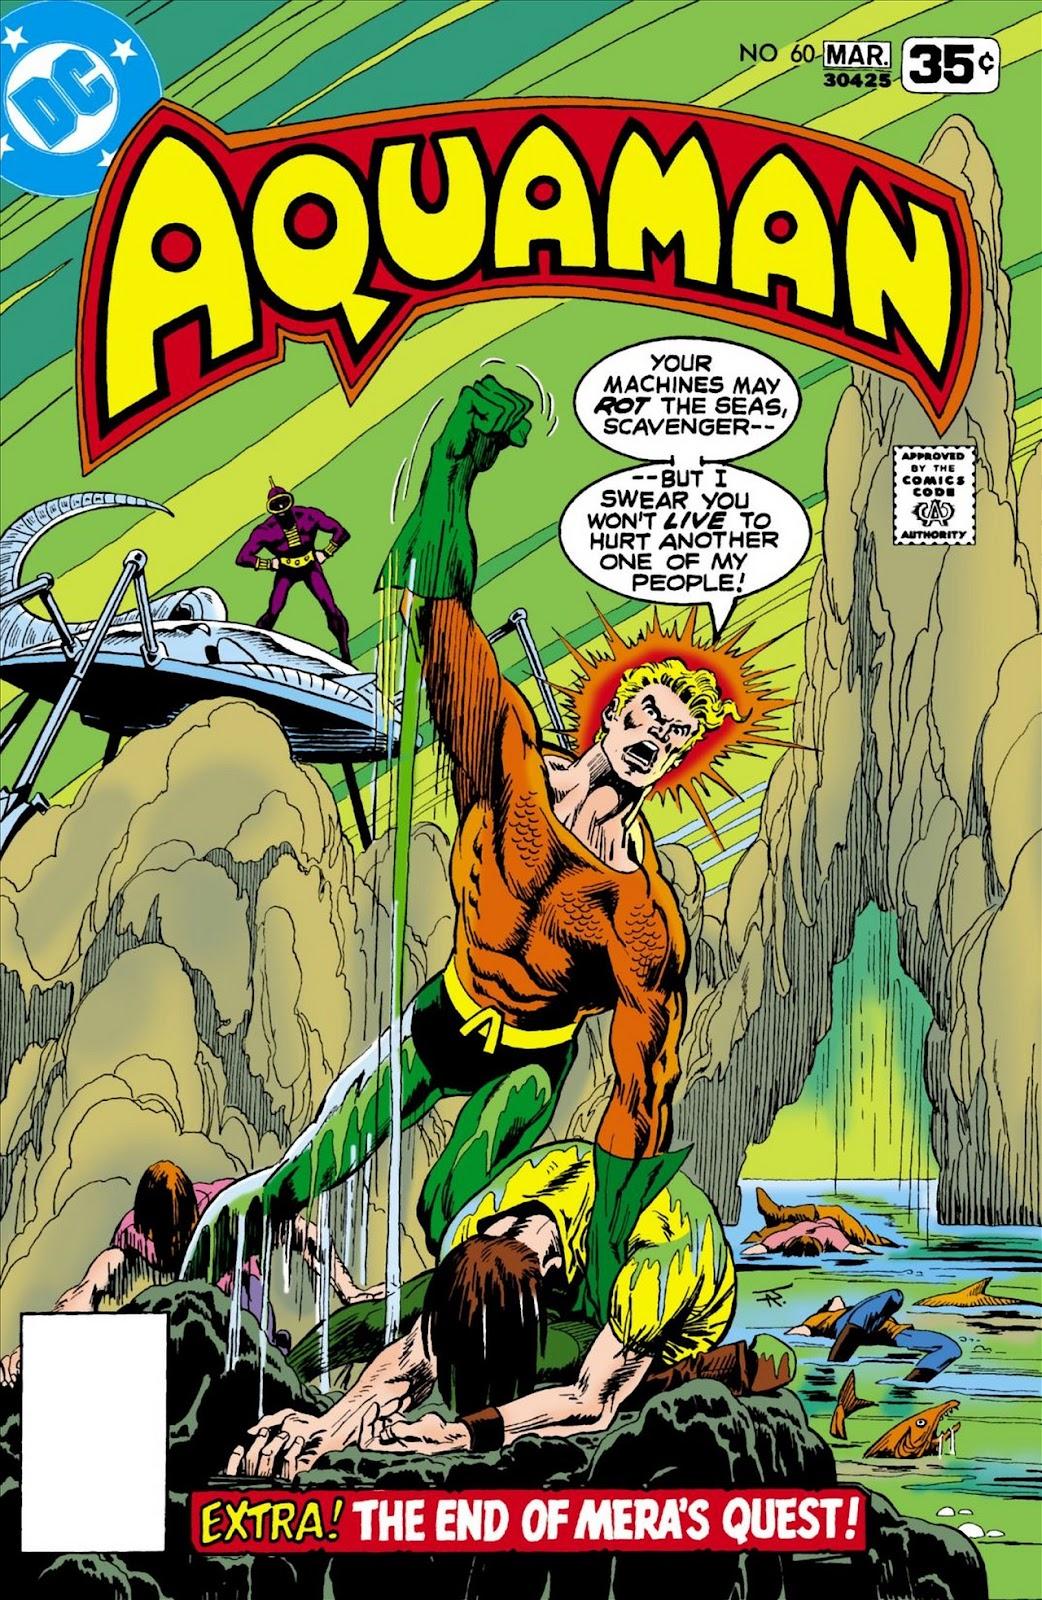 Aquaman (1962) issue 60 - Page 1